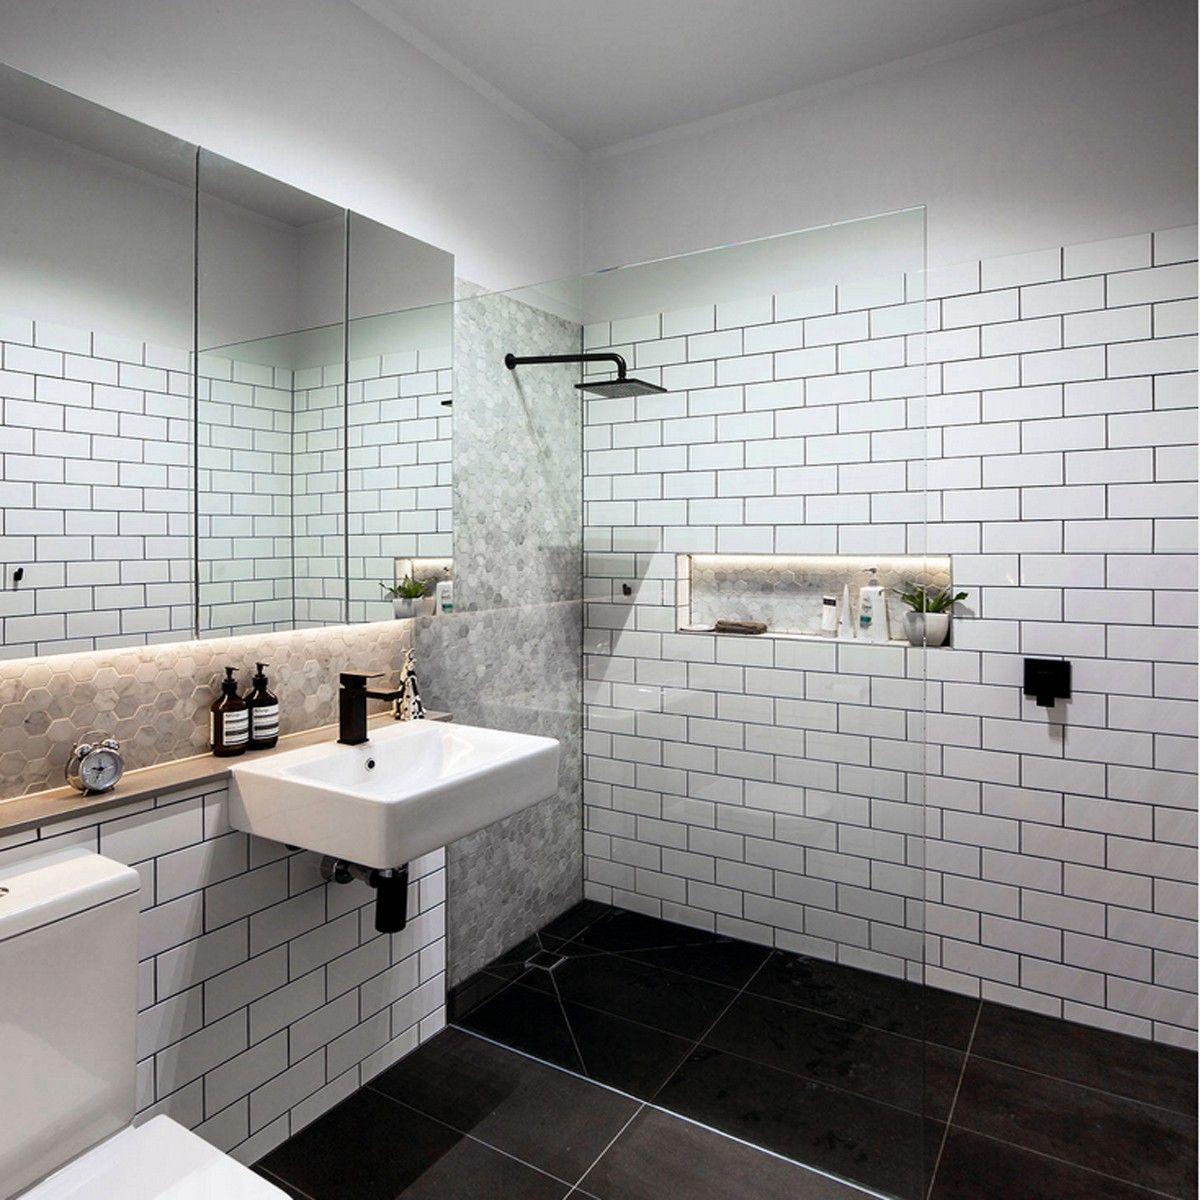 20x10 Flat Gloss White   power shower   Pinterest   Wall tiles ...